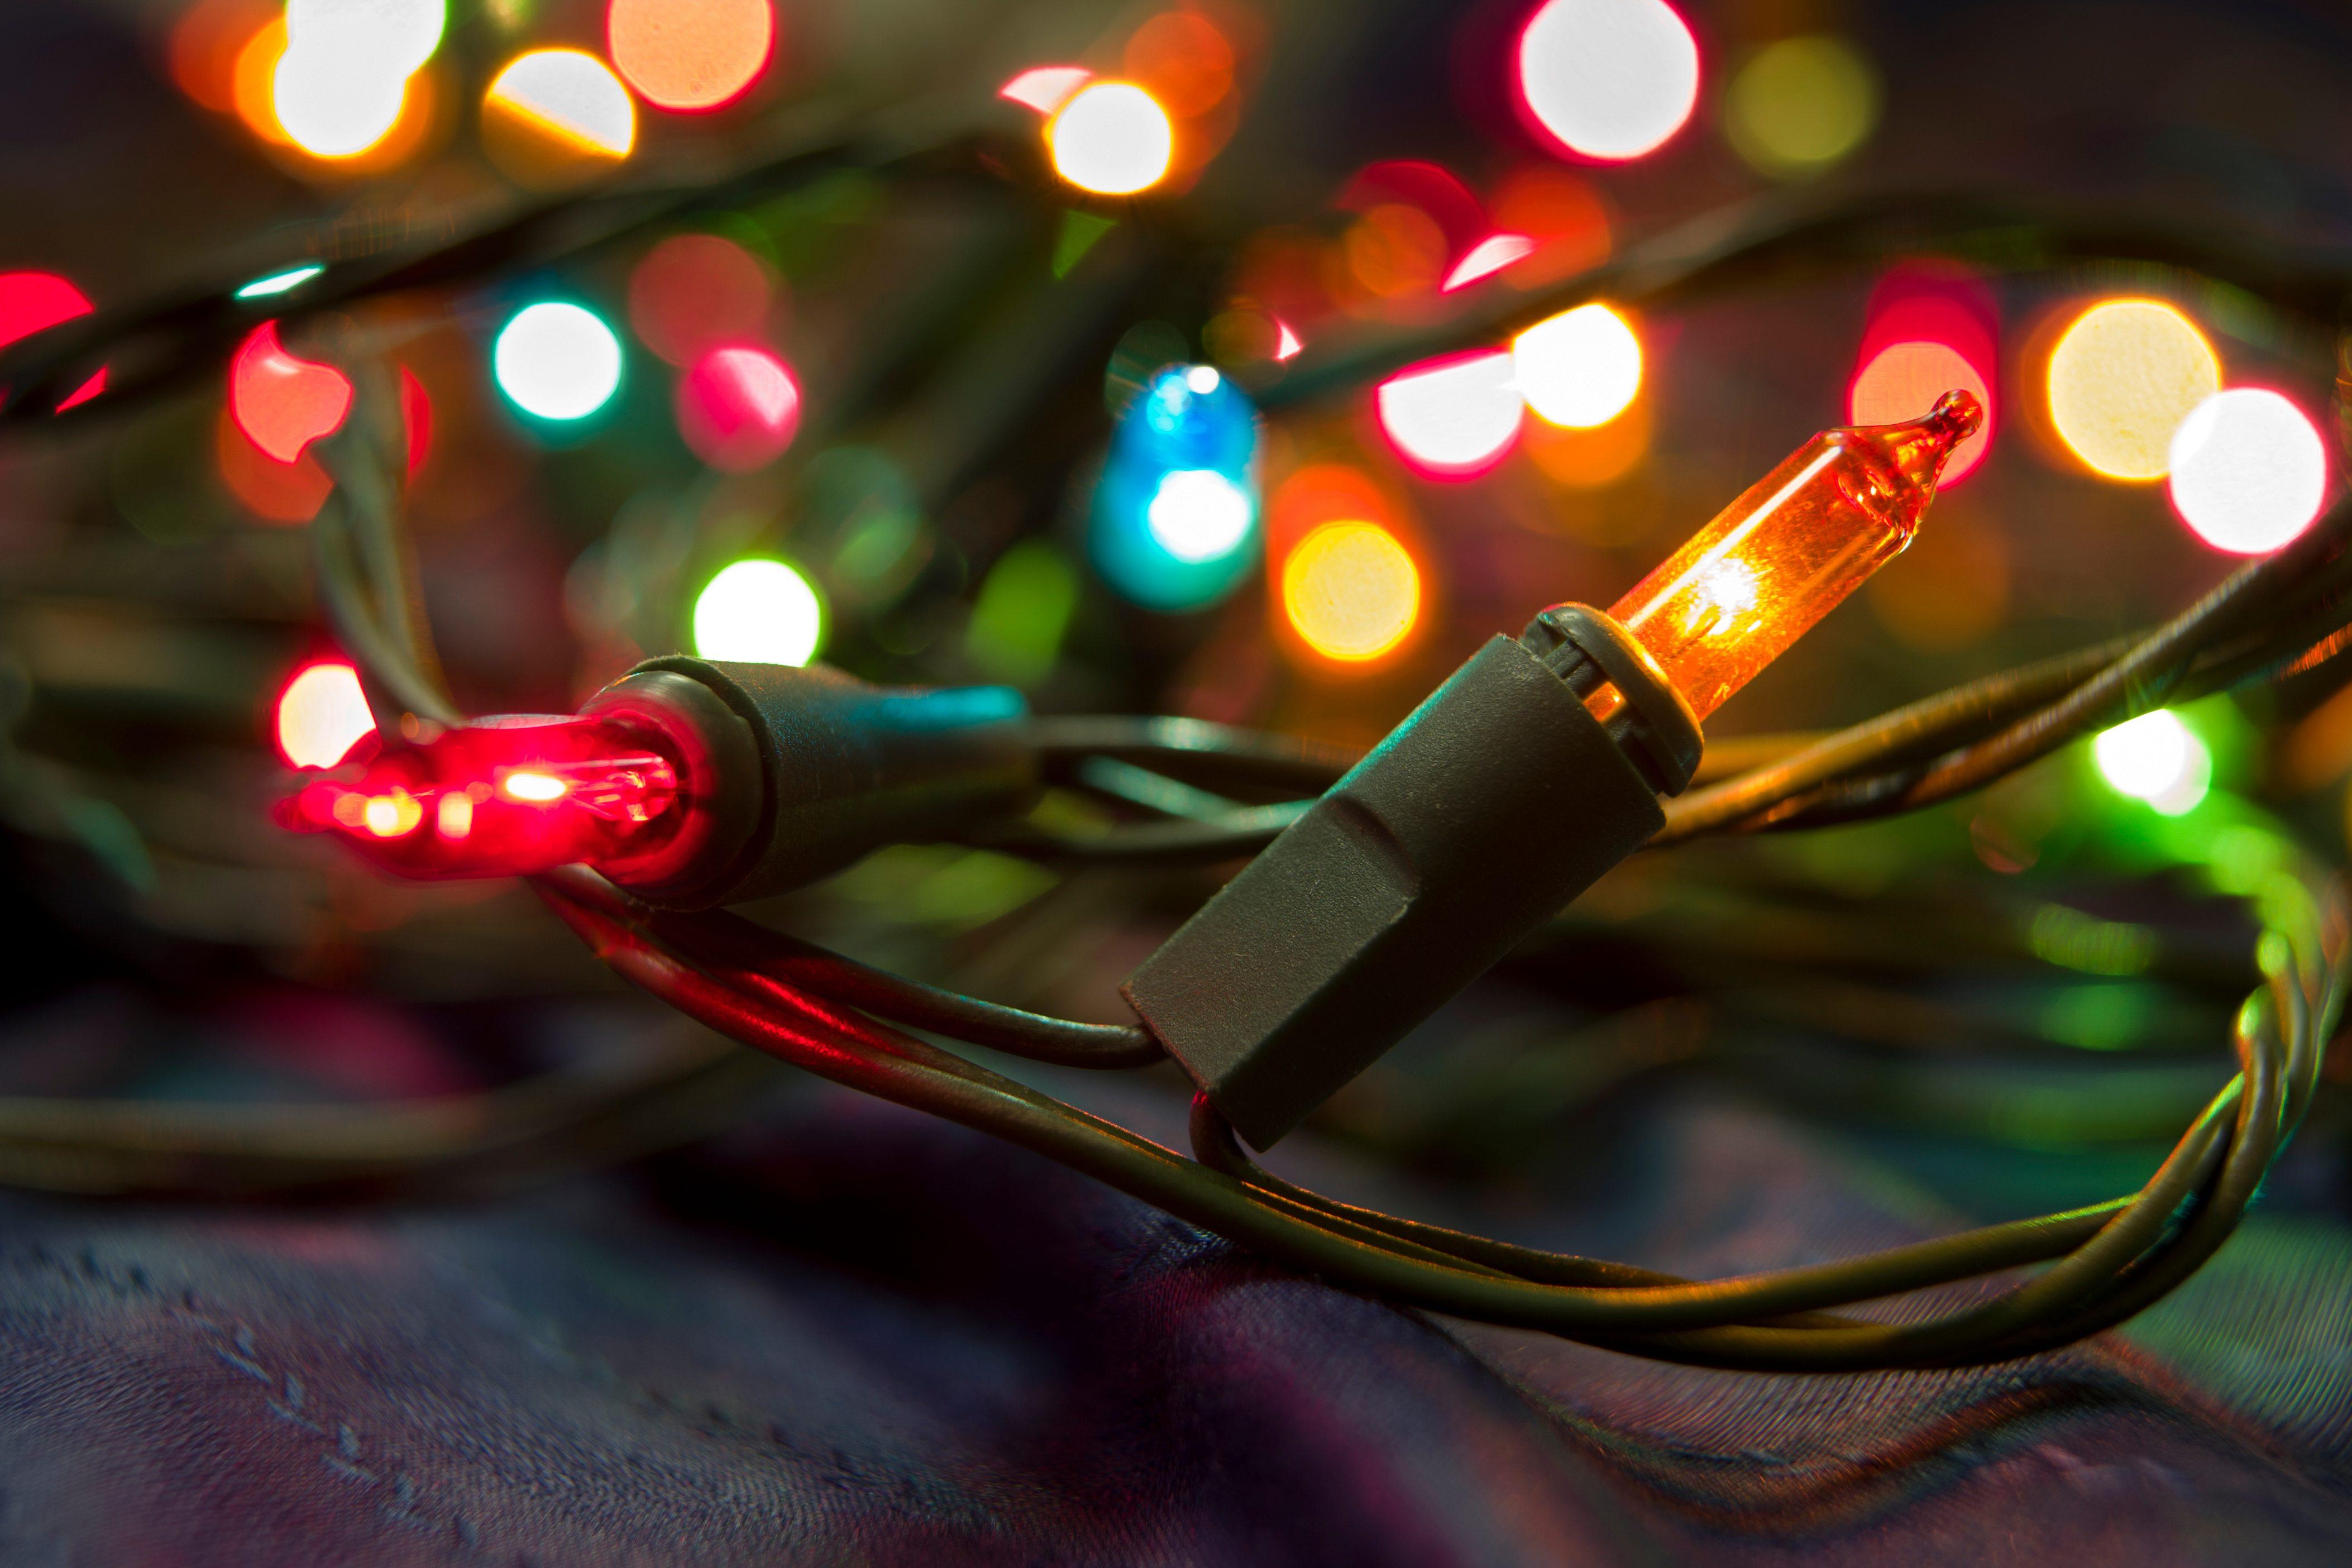 Illuminated colored Christmas fairy lights